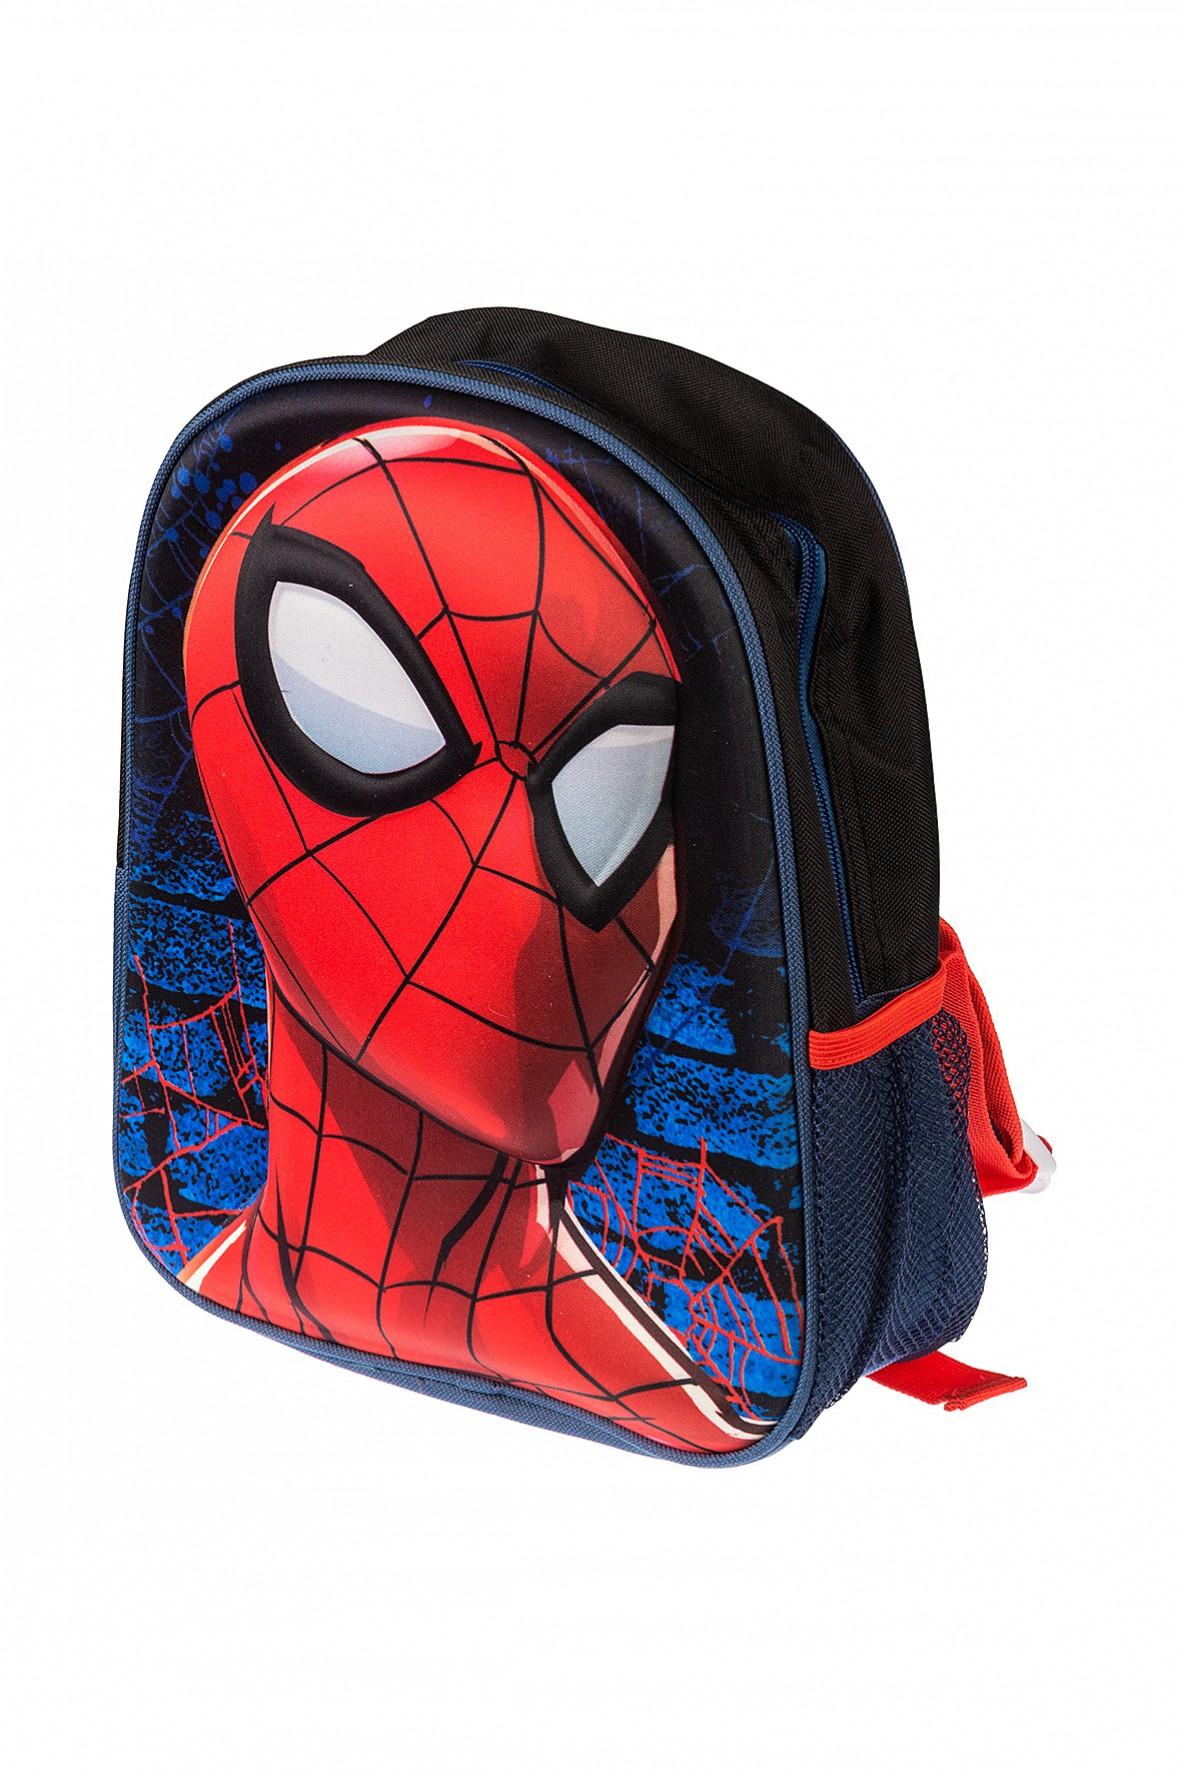 Spiderman plecak dla dziecka